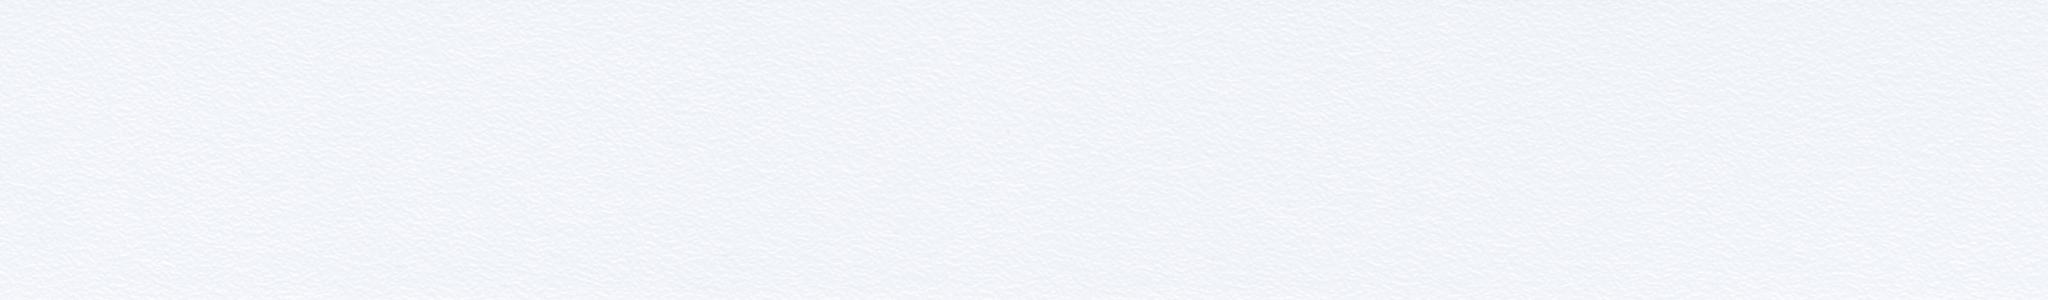 HU 10169 Chant ABS Blanc Perle XG